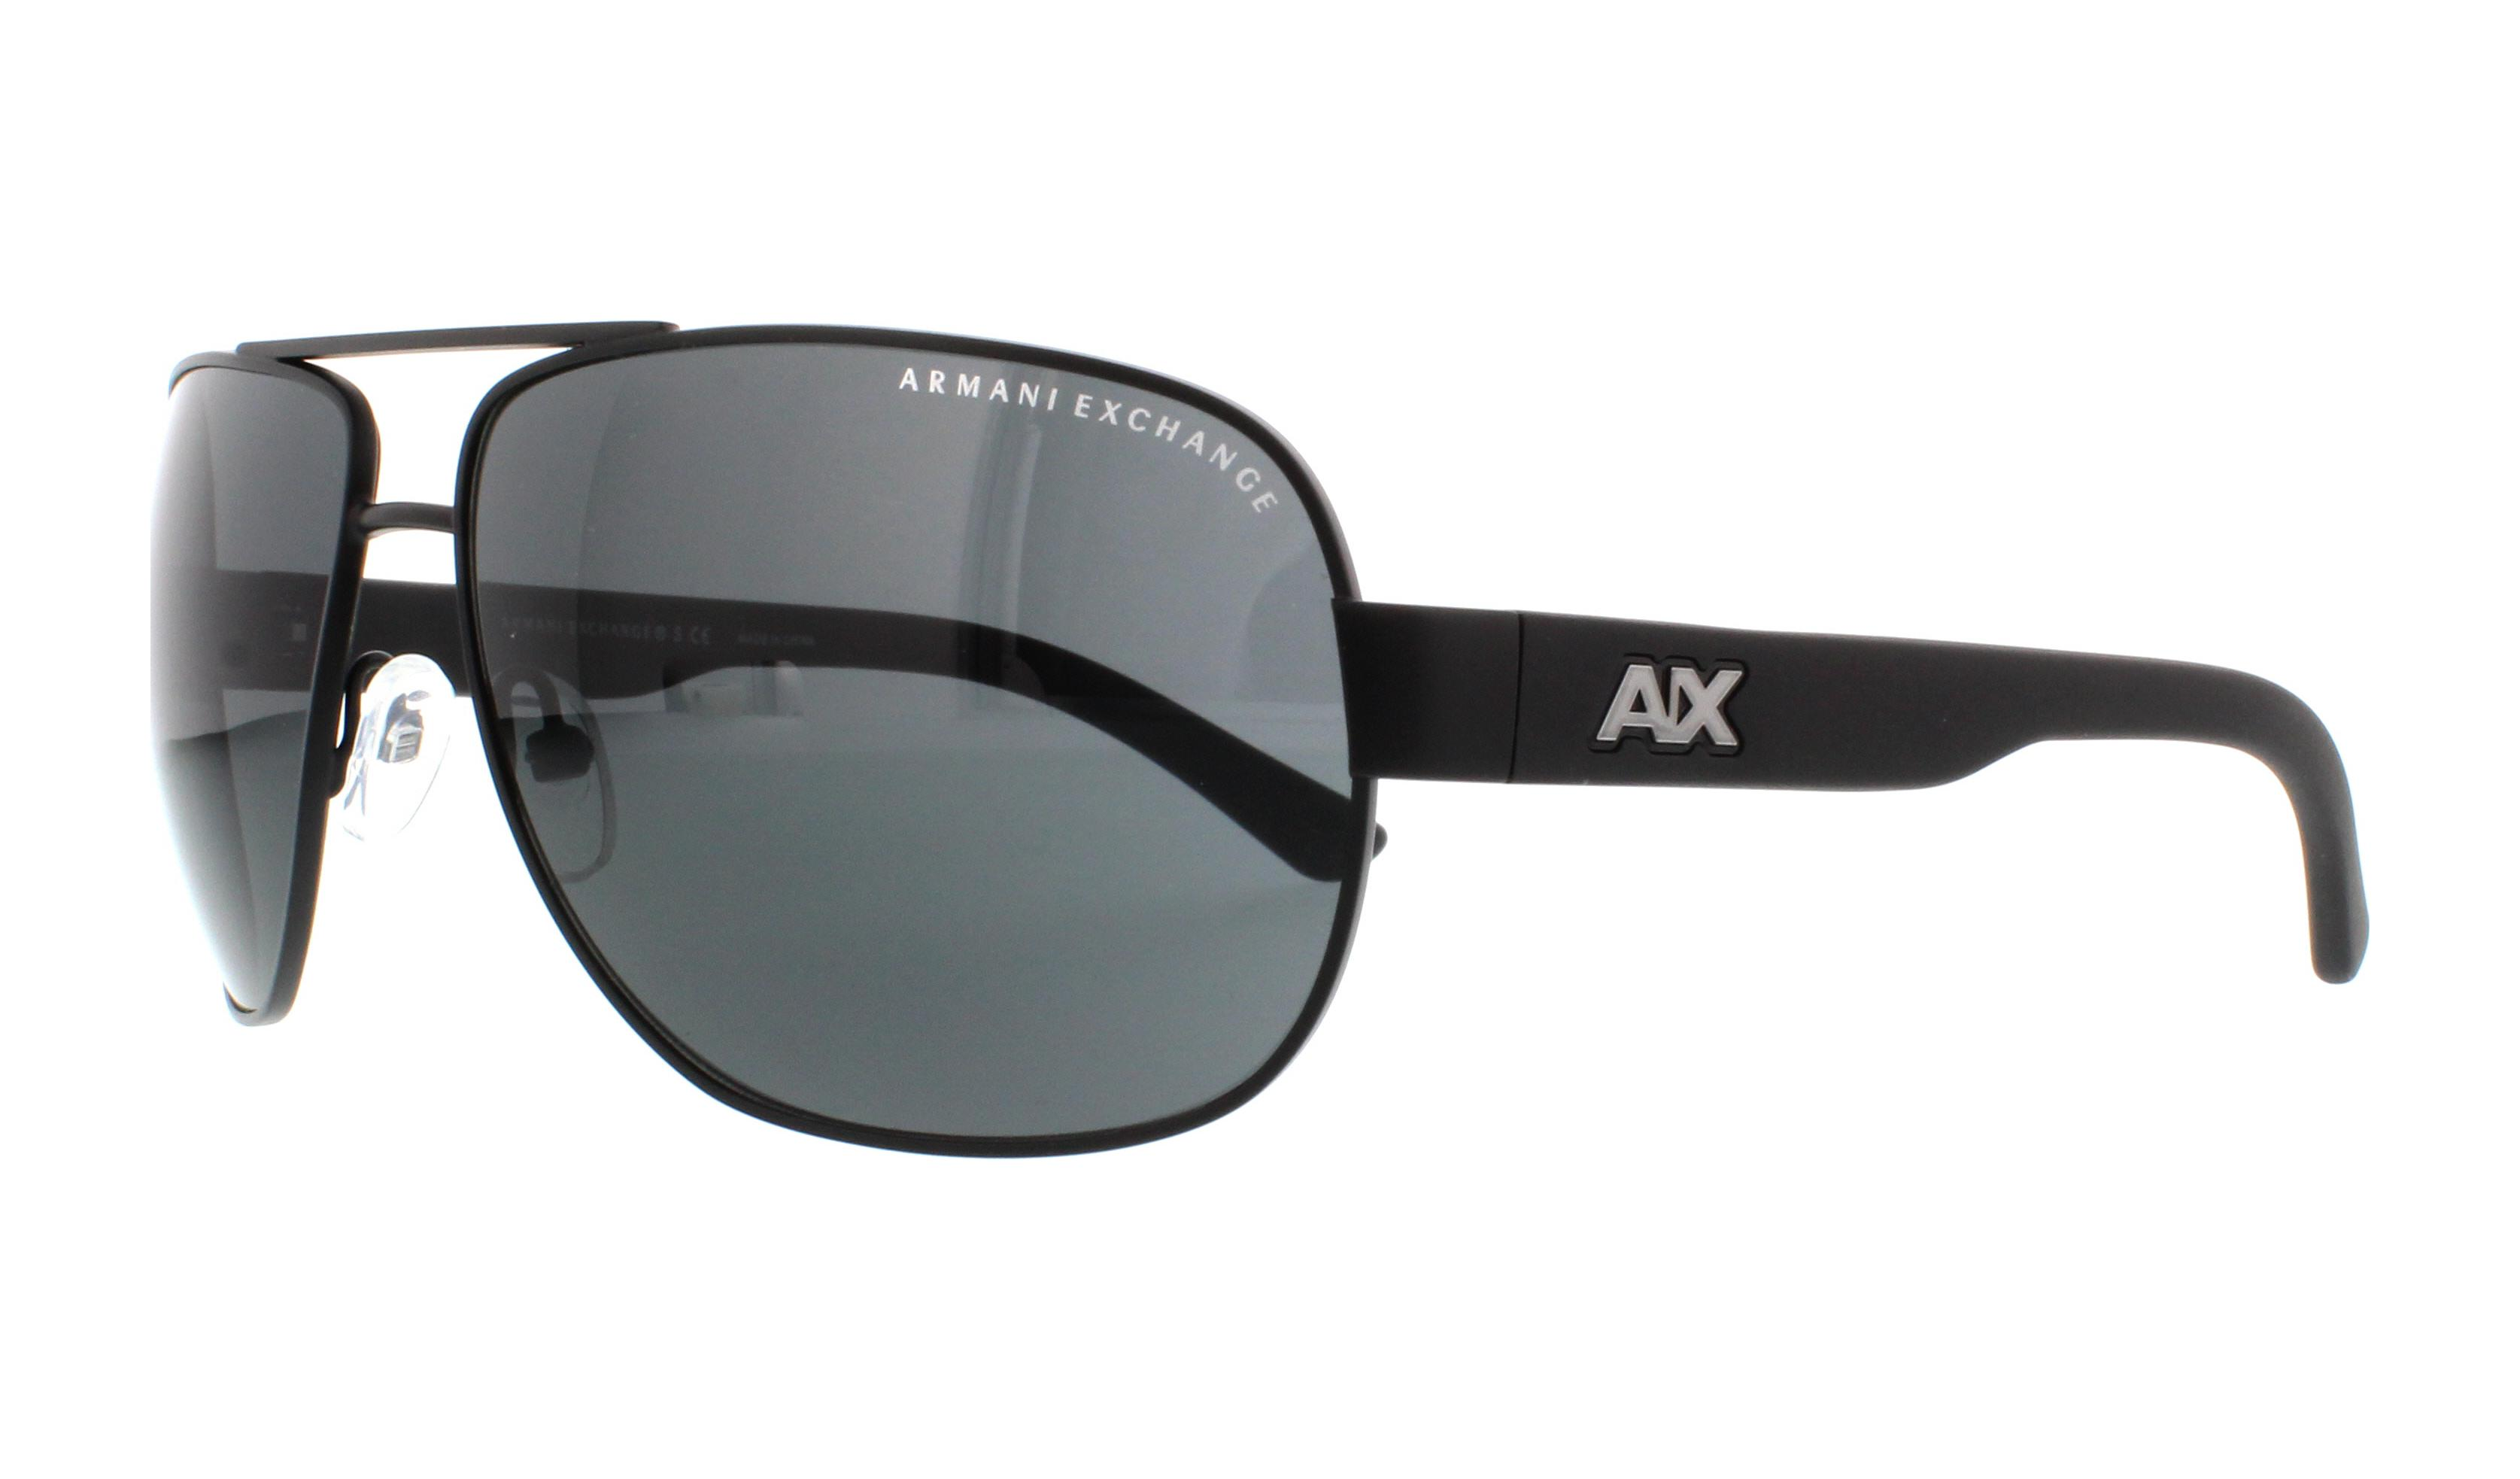 bada7097ce3 Armani Exchange Sunglasses For Sale